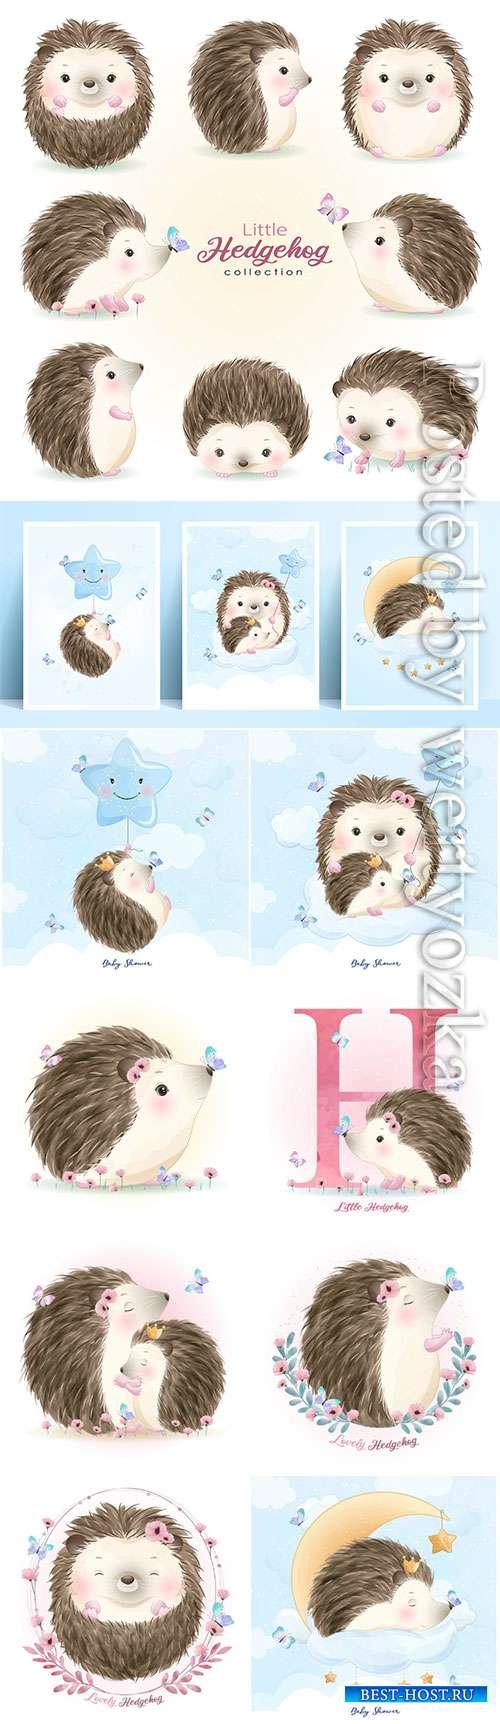 Cute doodle hedgehog set with watercolor vector illustration